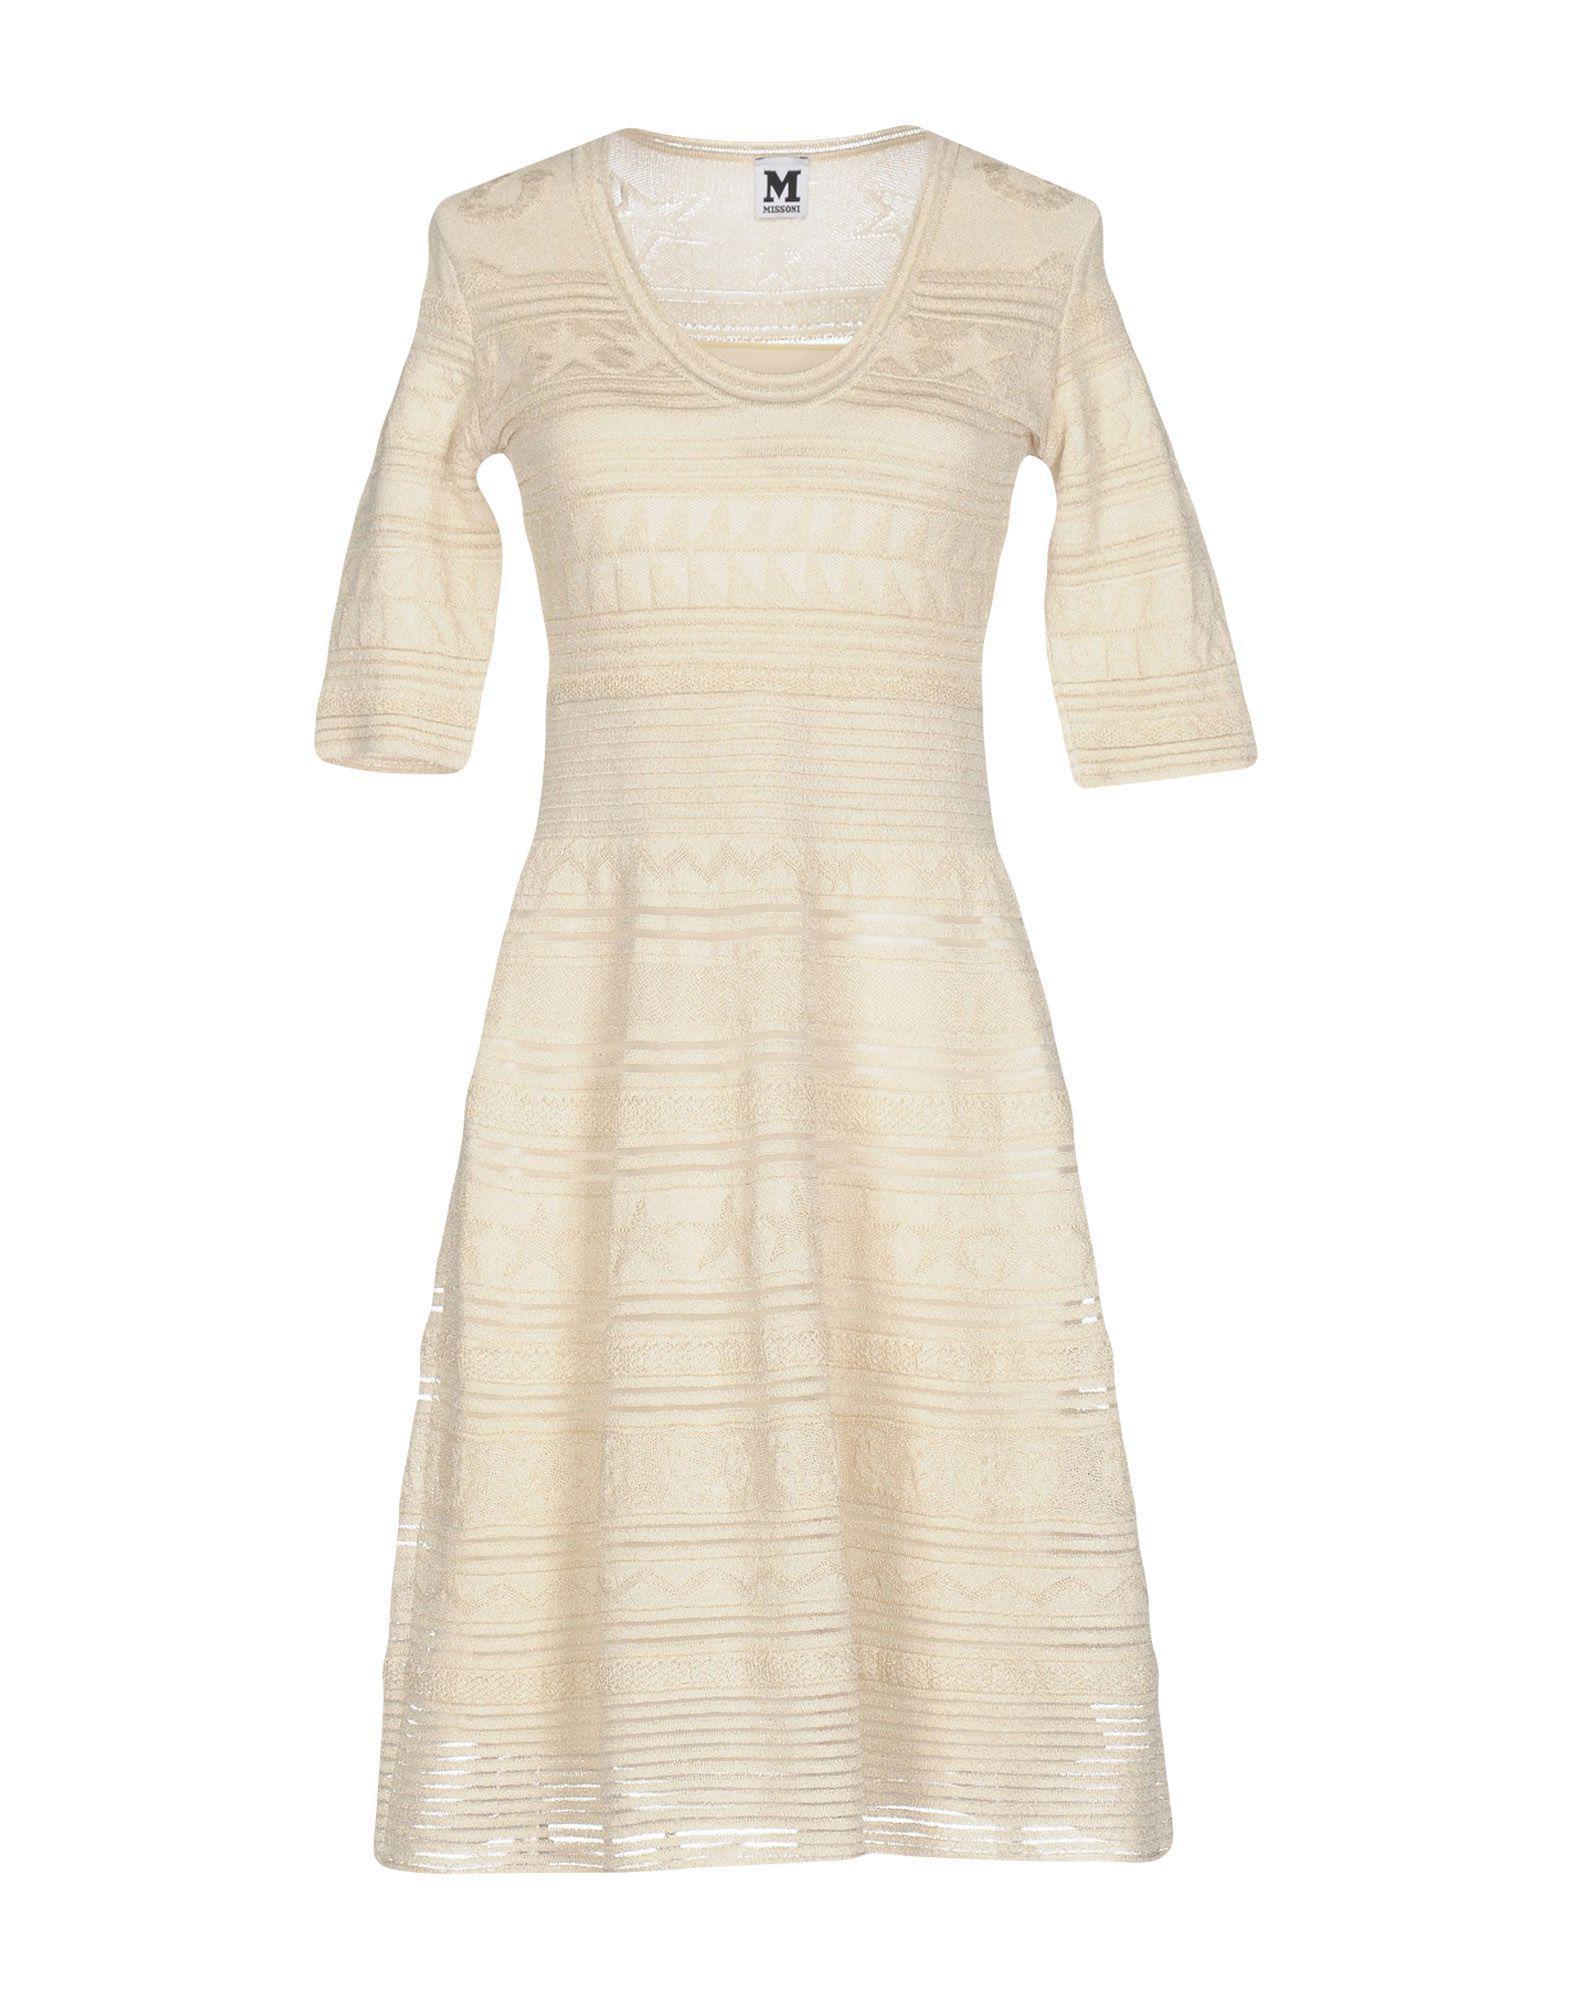 24031883307d Lyst - M Missoni Short Dress in White